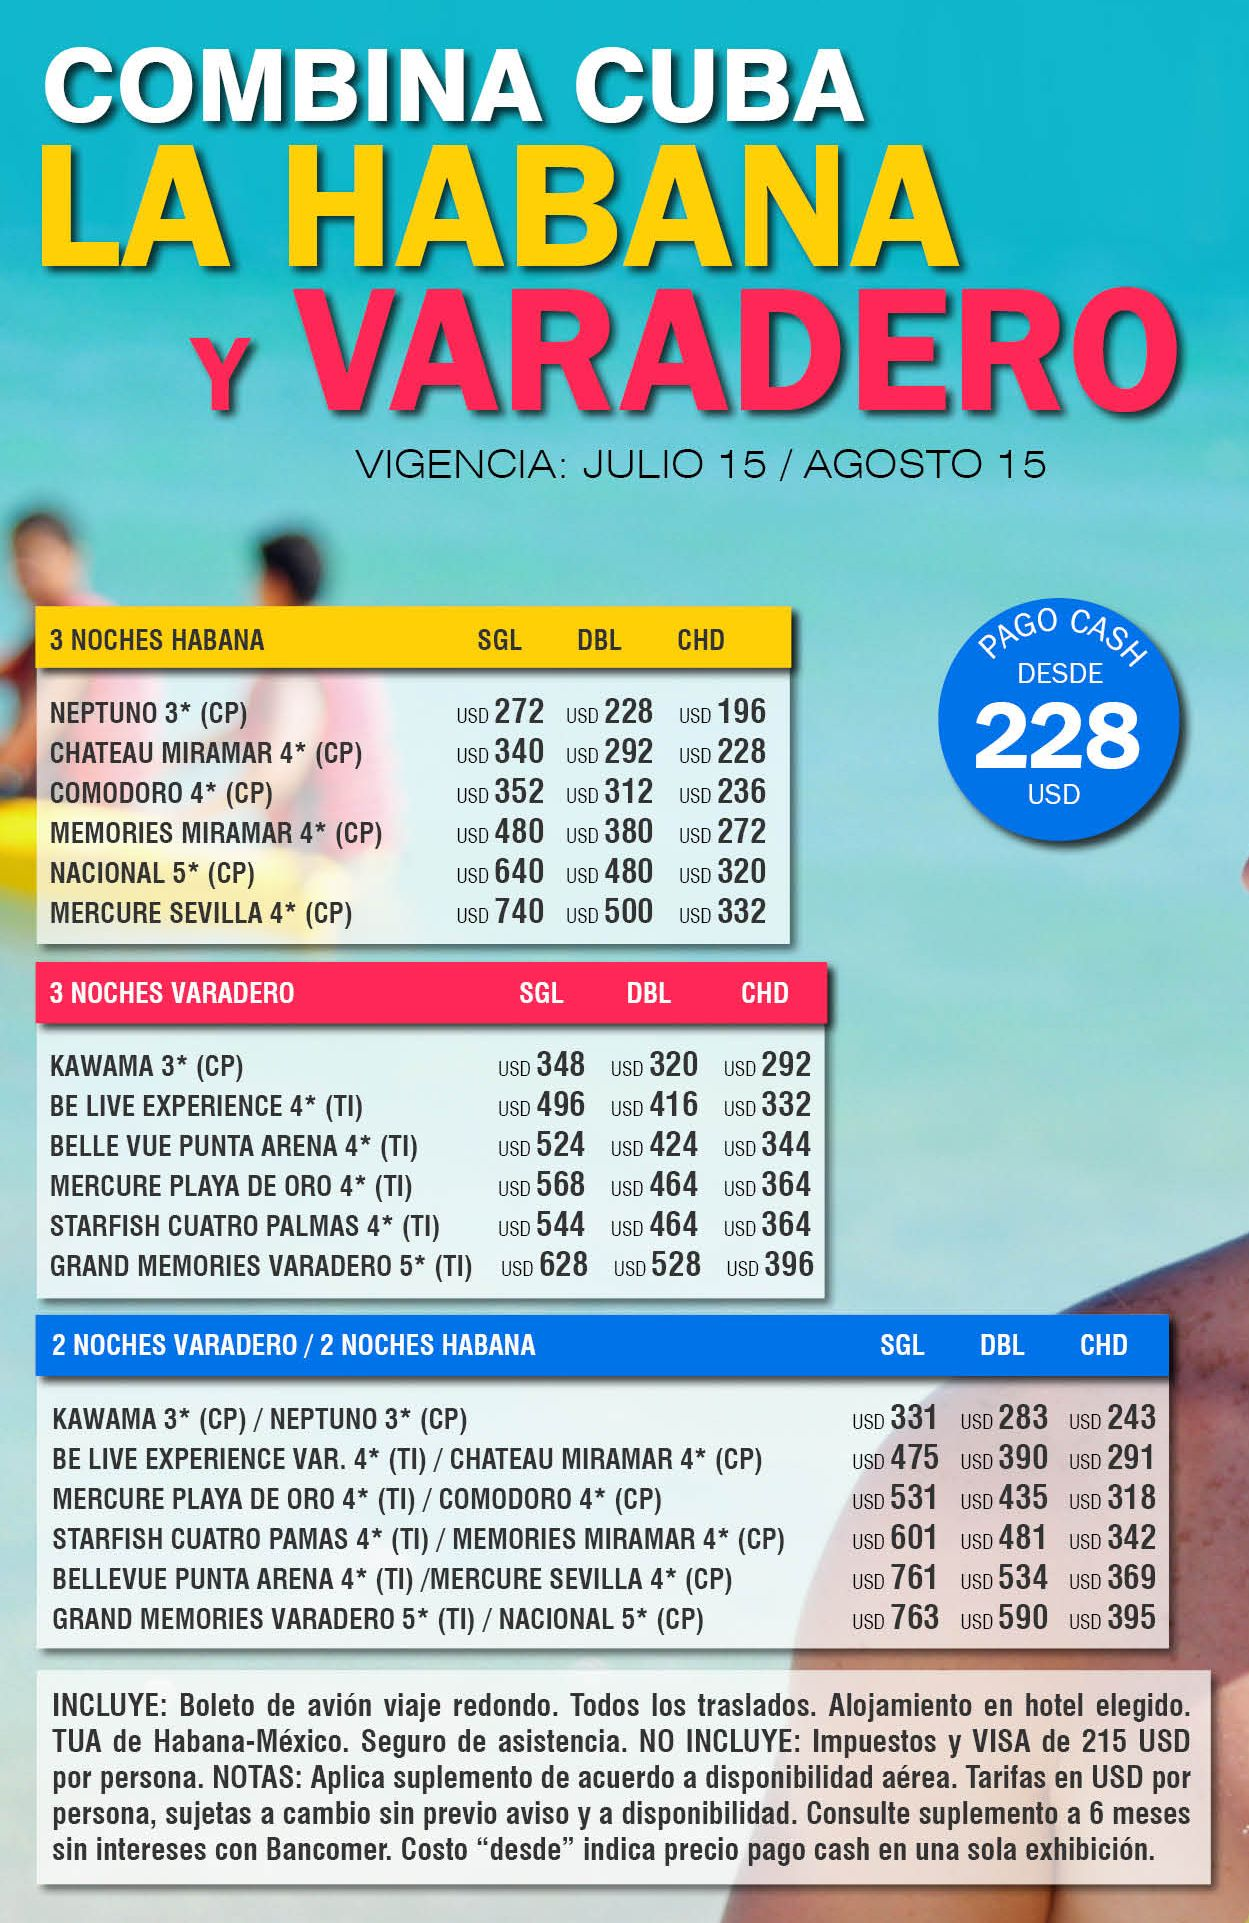 Combina Cuba La Habana y Varadero